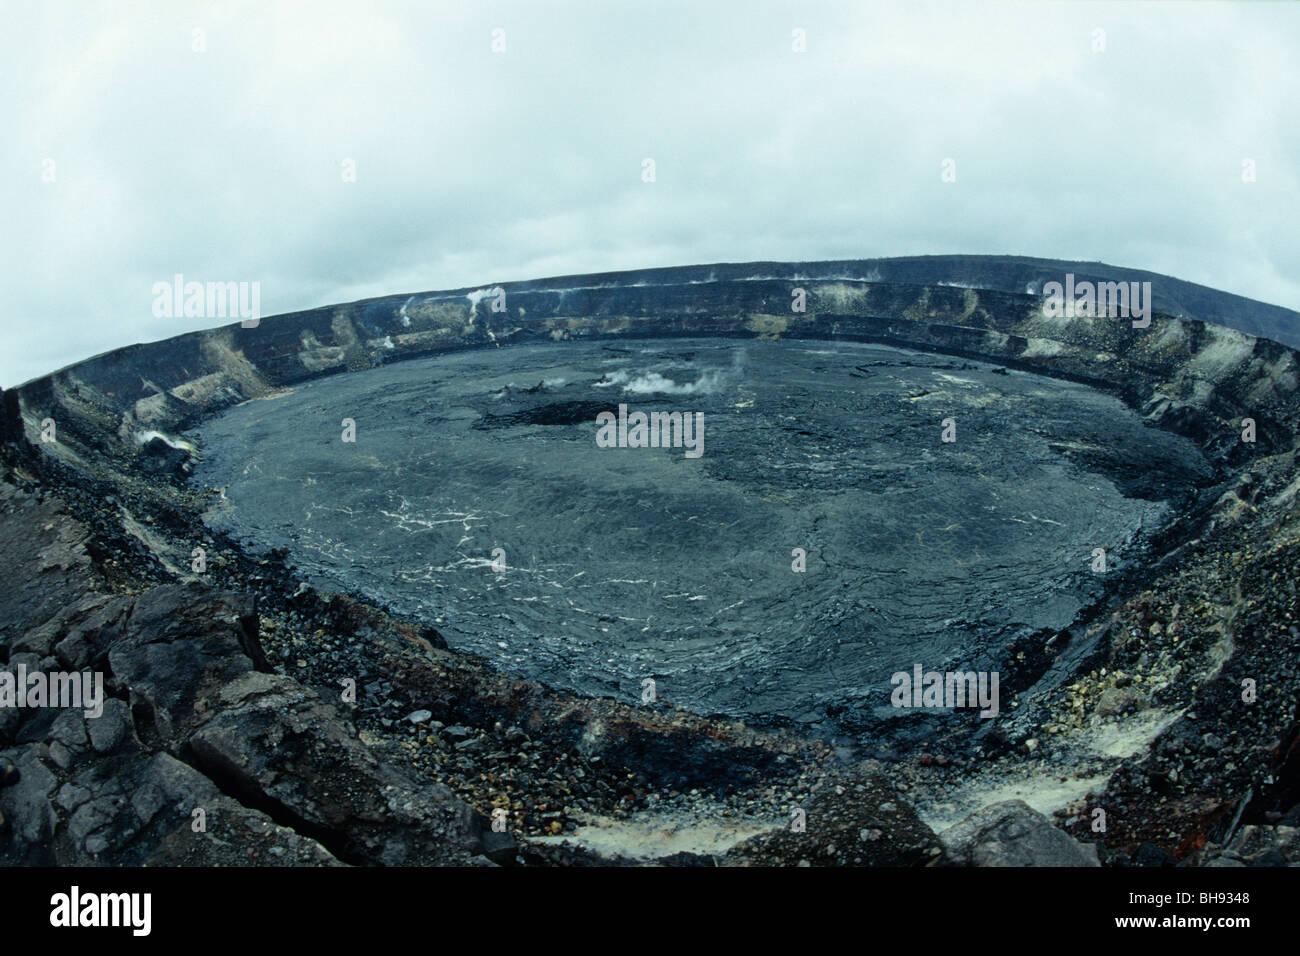 Caldera of Kilauea Volcano, Kona, Big Island, Hawaii, USA - Stock Image